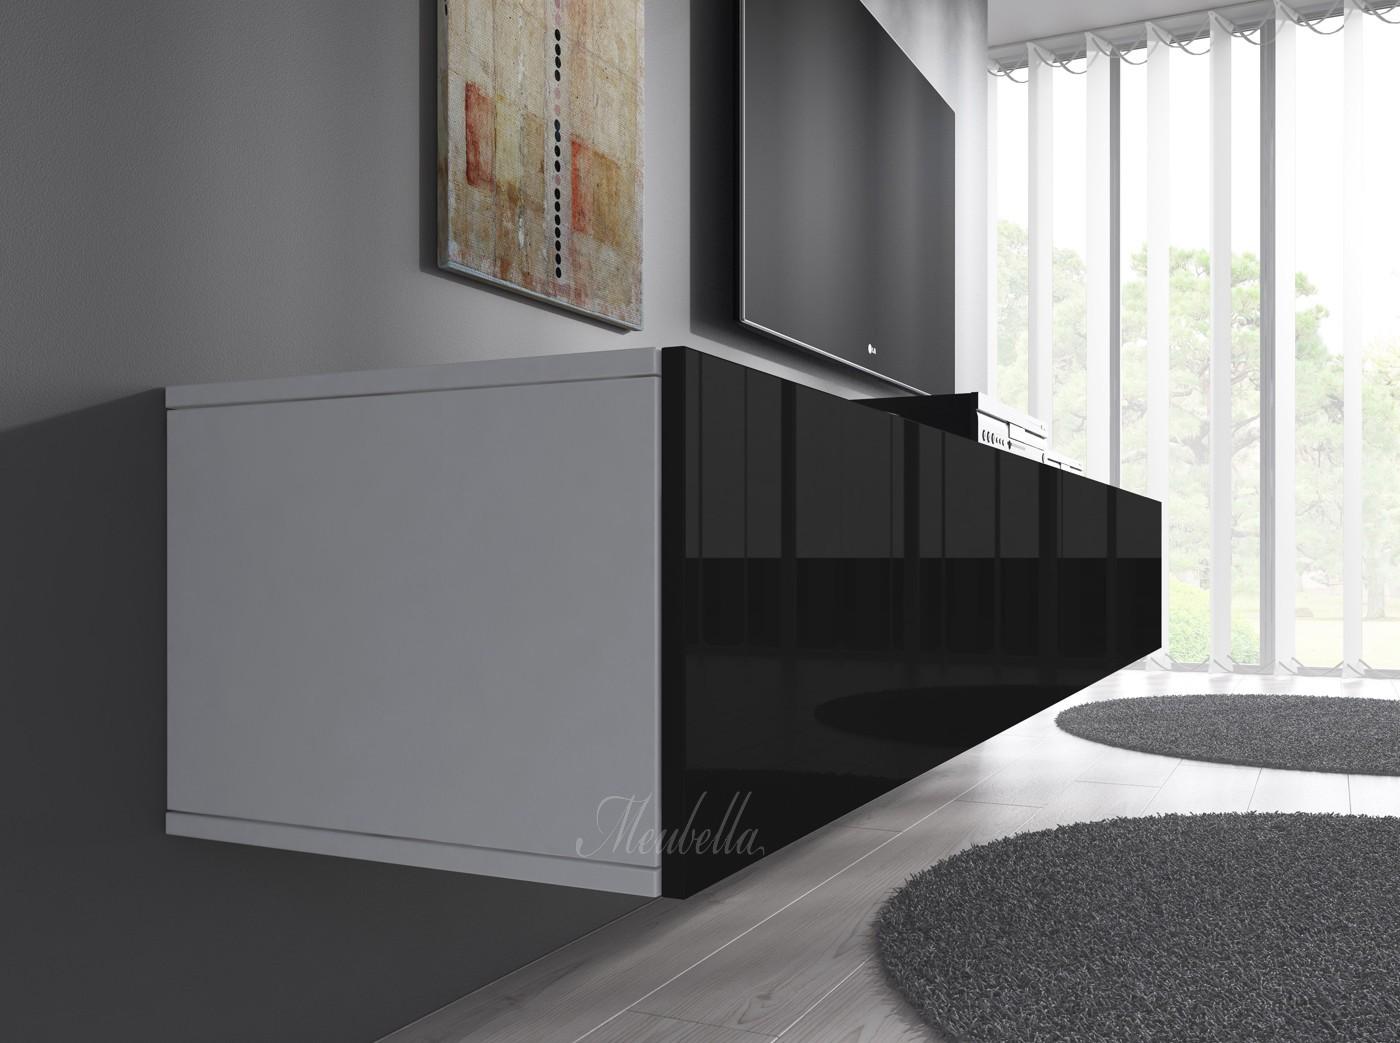 TV-Meubel Flame 3 - XL - Zwart - Wit - 200 cm - TV-meubels ...